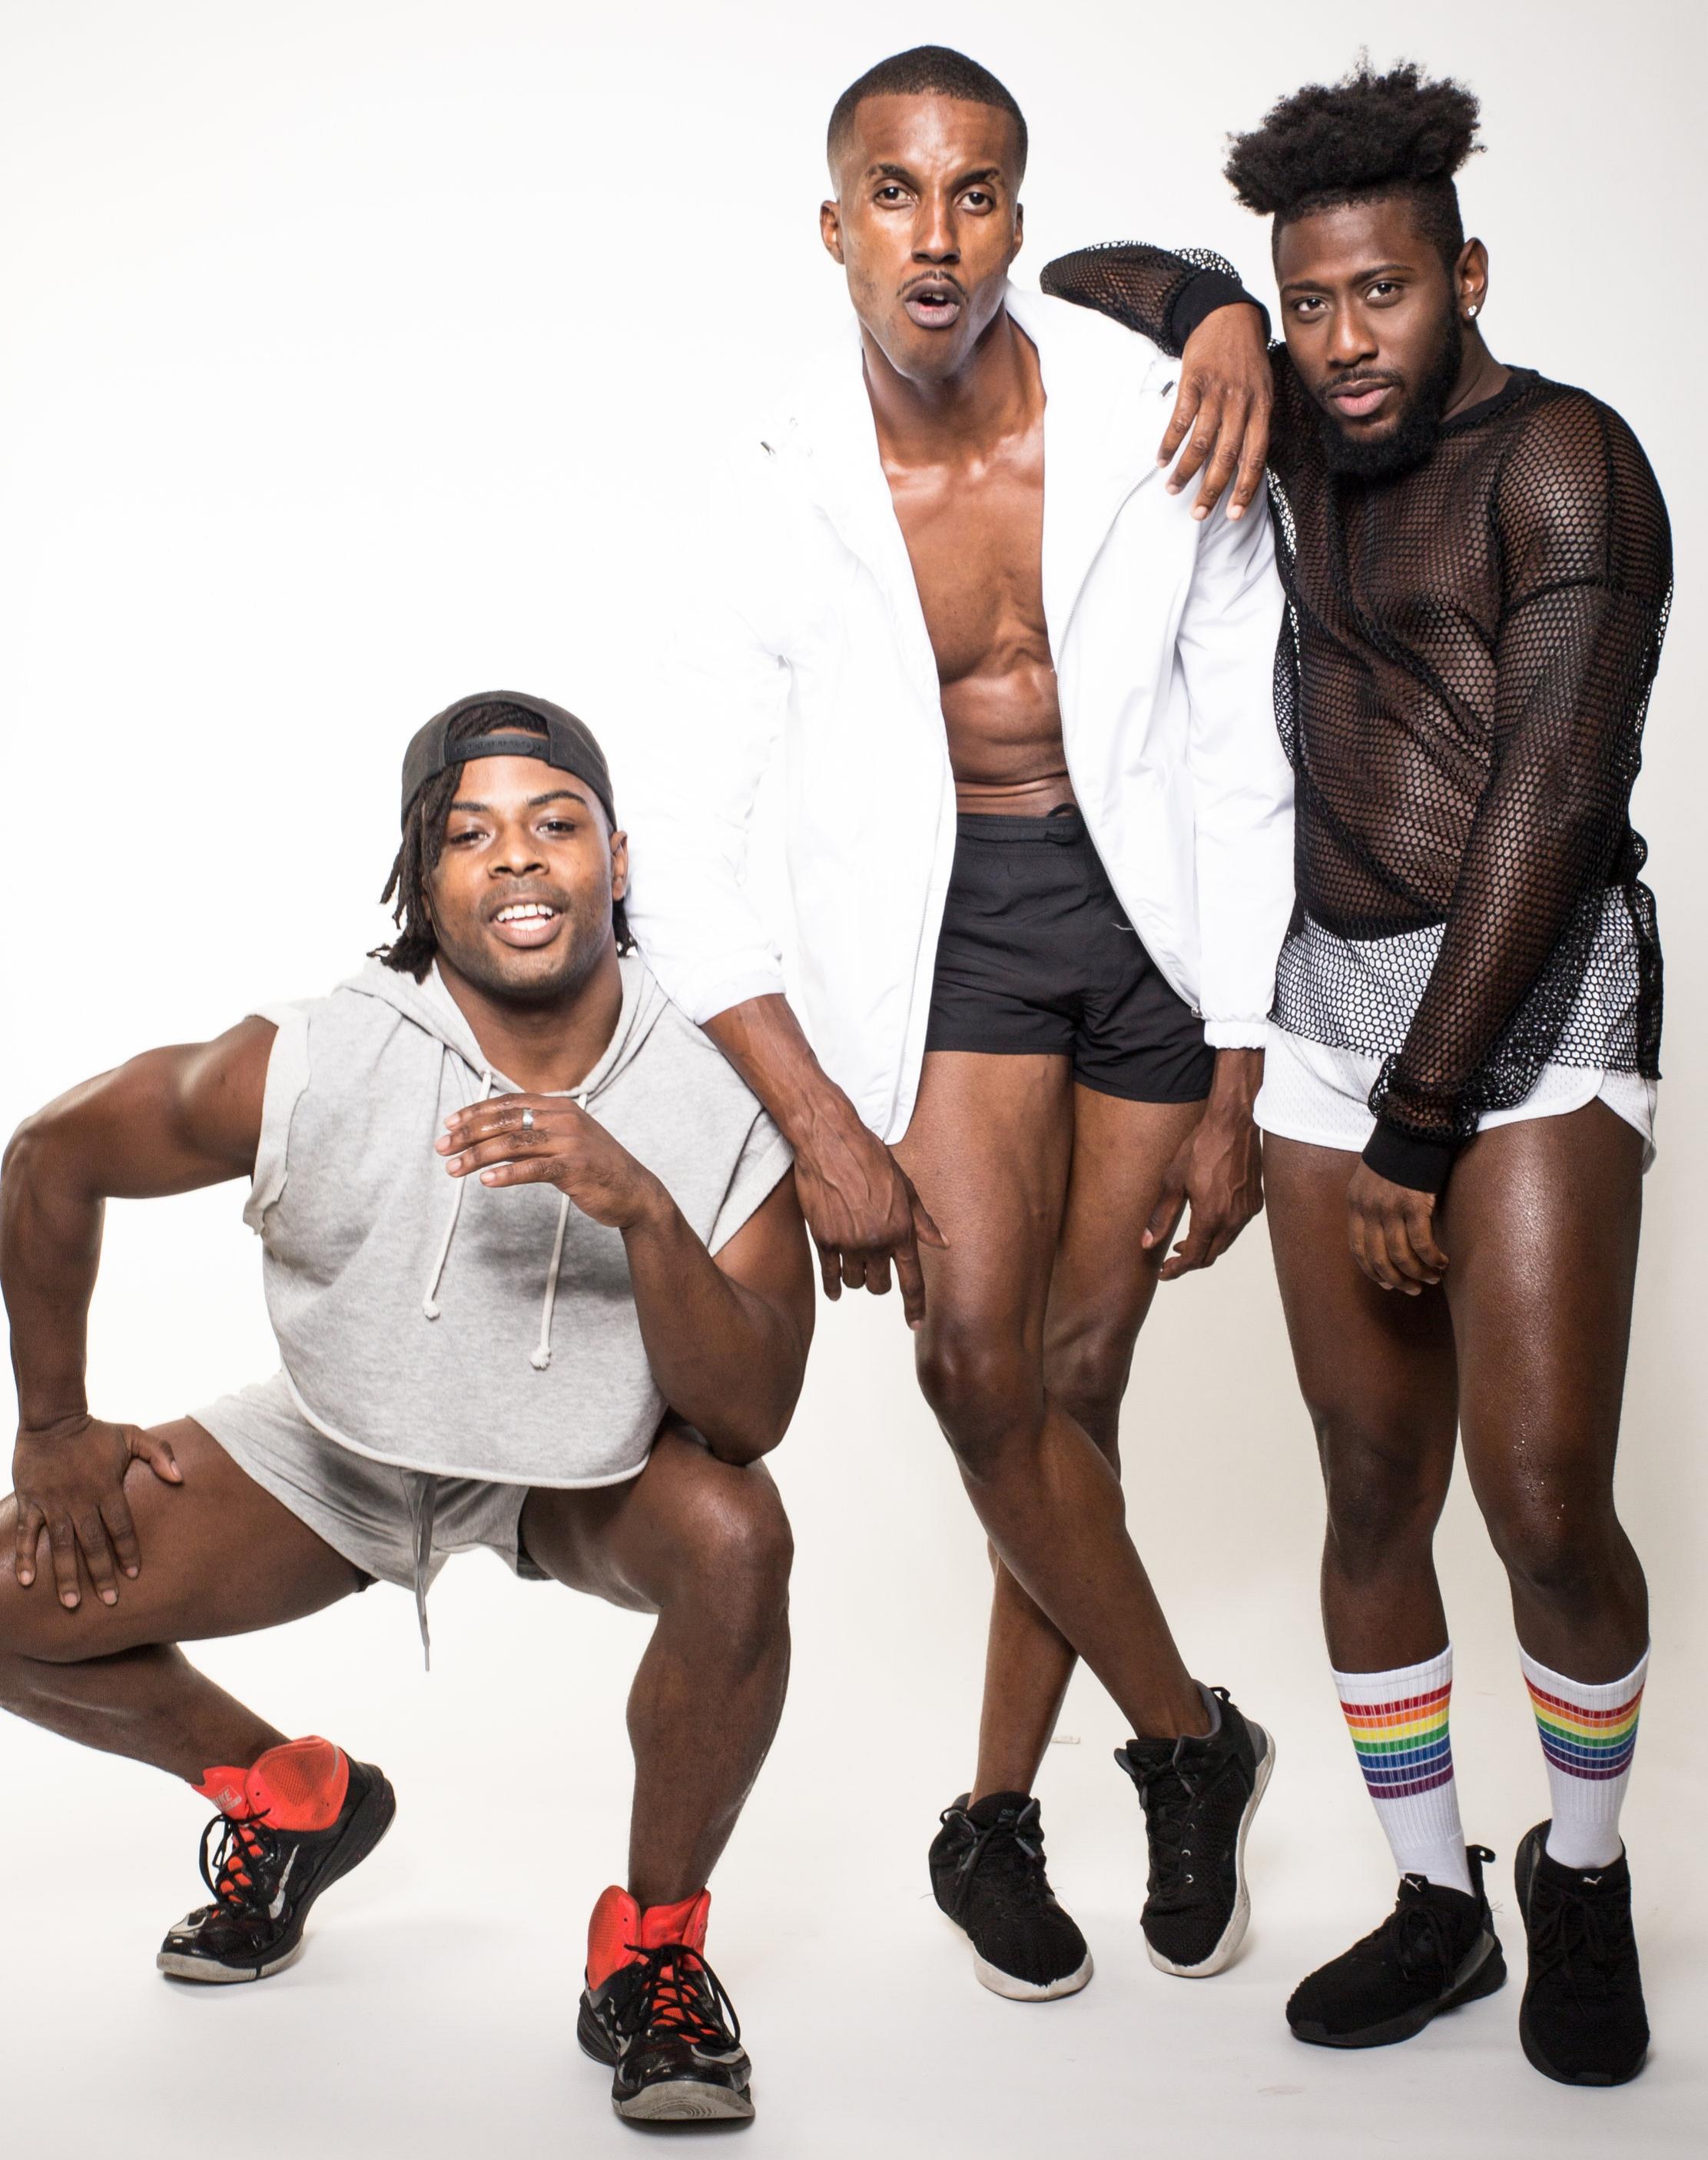 Karma and boys at fun dance workout.jpg